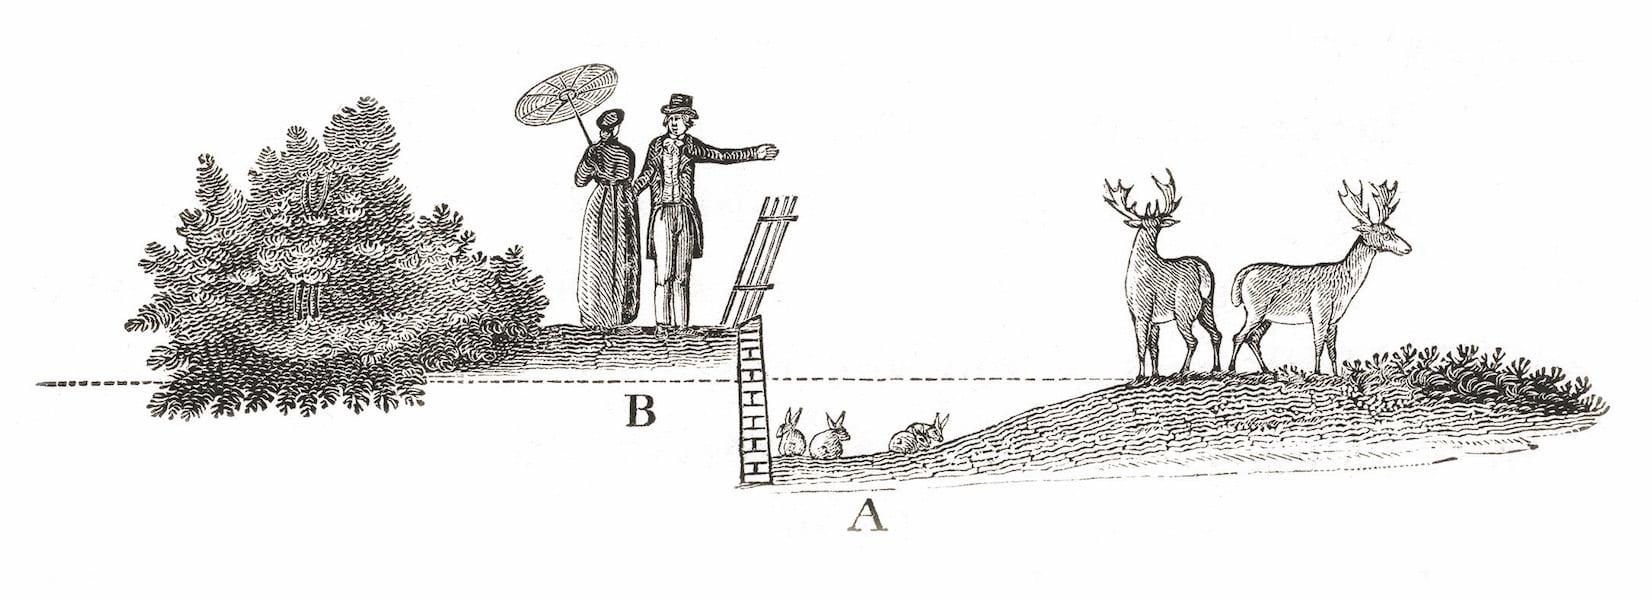 Illustration of Humphrey Repton's 'ha ha' in 'Planting Dreams - Shaping Australian Gardens' p33